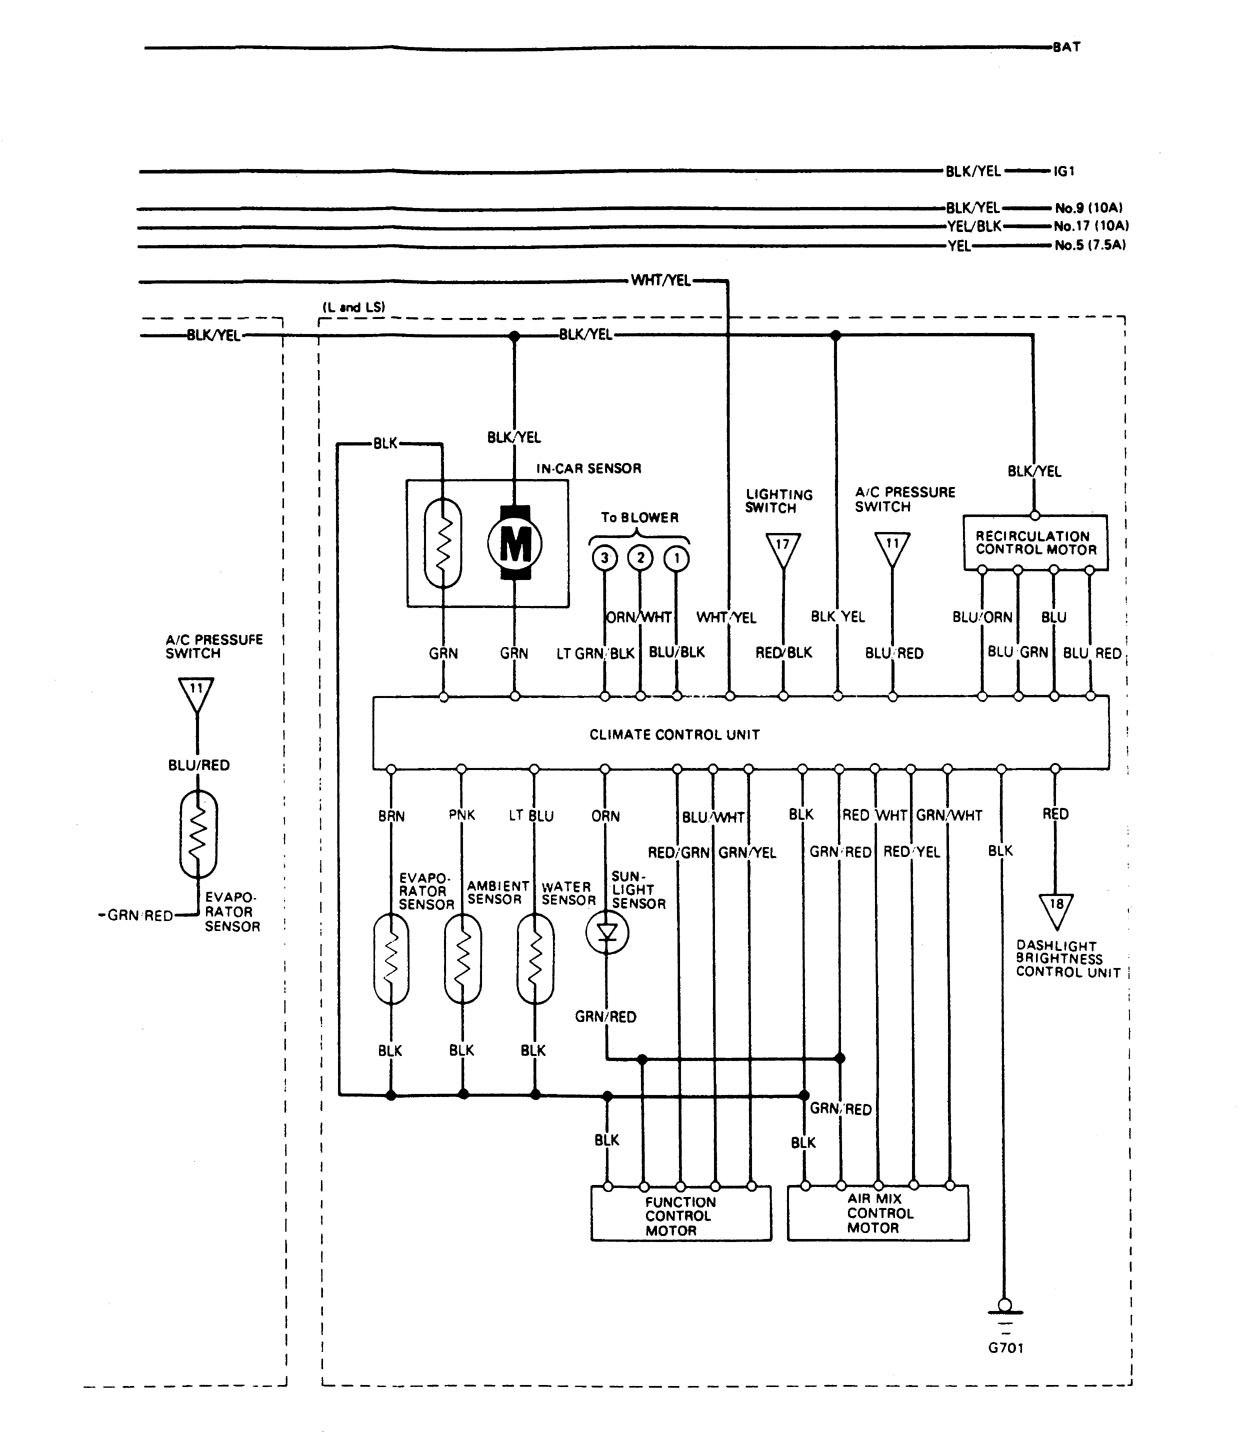 94 acura legend stereo wiring diagram simplicity 4211 1989 hvac controls